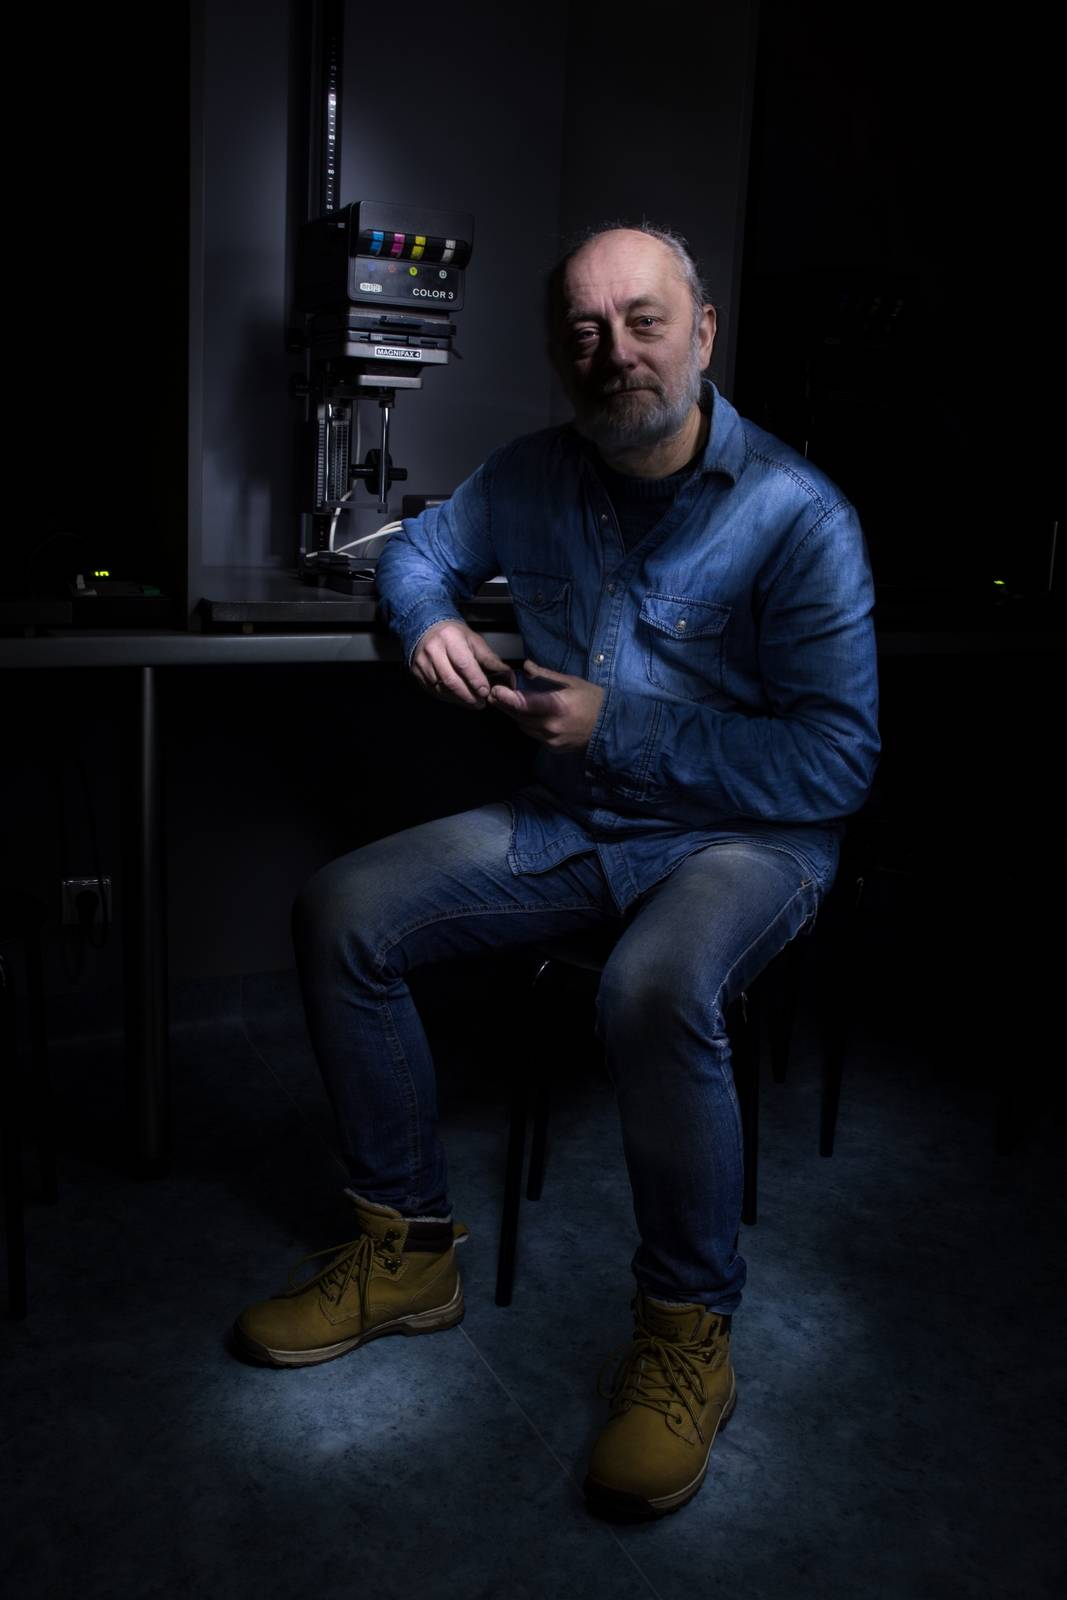 Antoni - fotograf